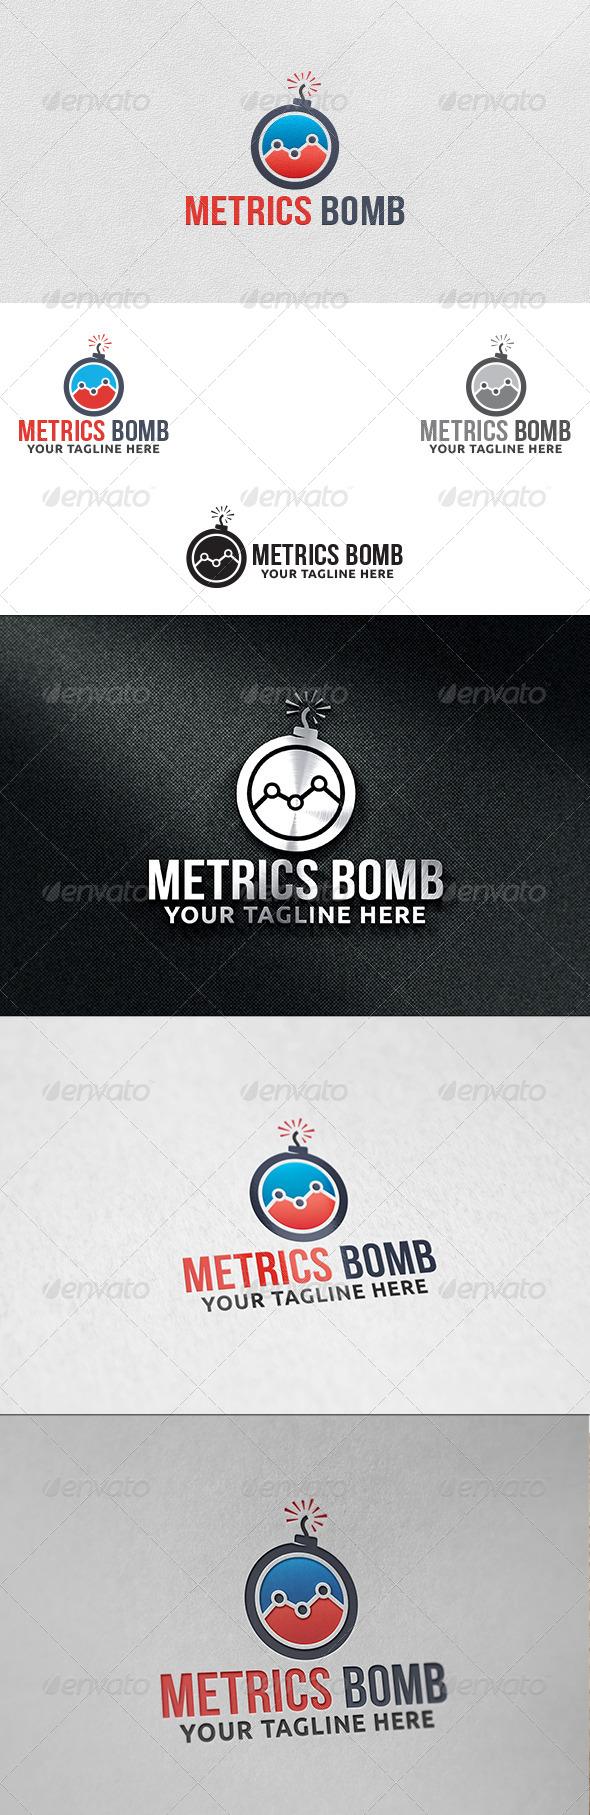 Metrics Bomb - Logo Template - Objects Logo Templates